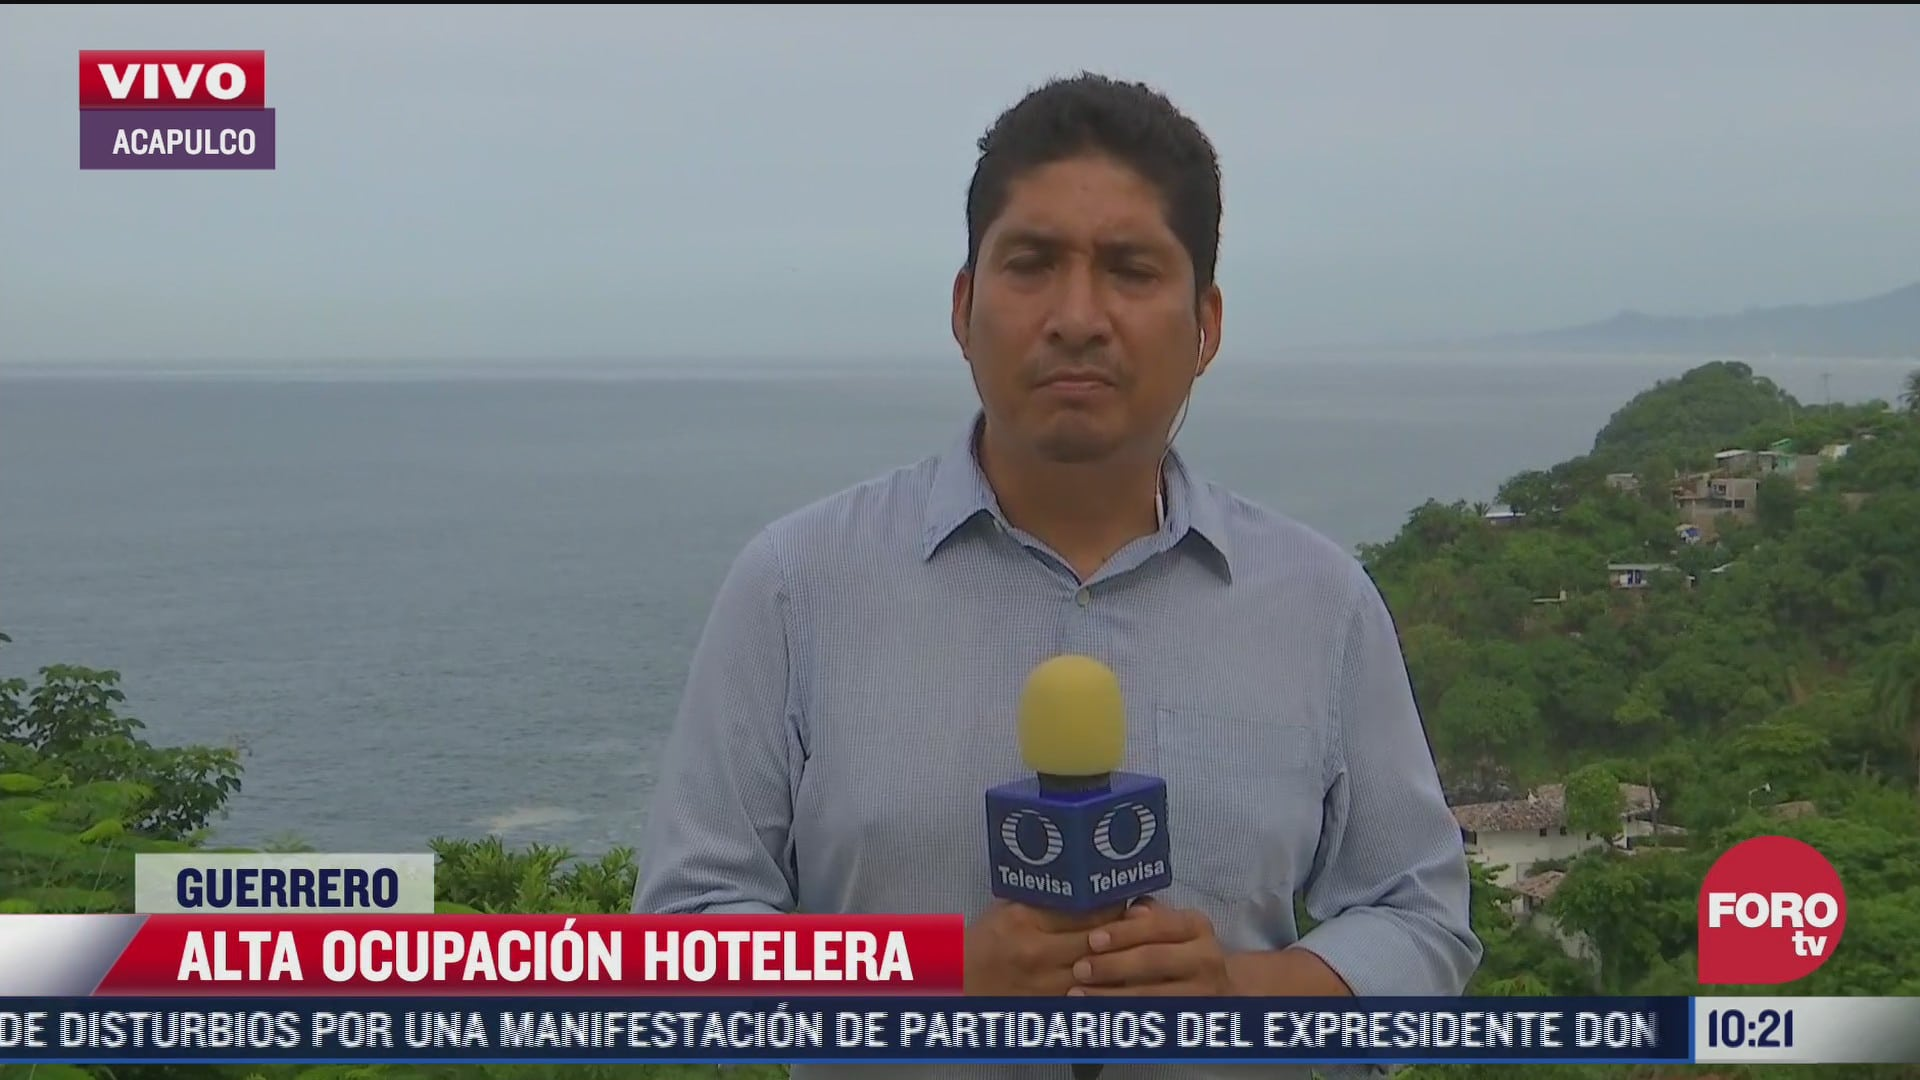 acapulco registra alta ocupacion hotelera